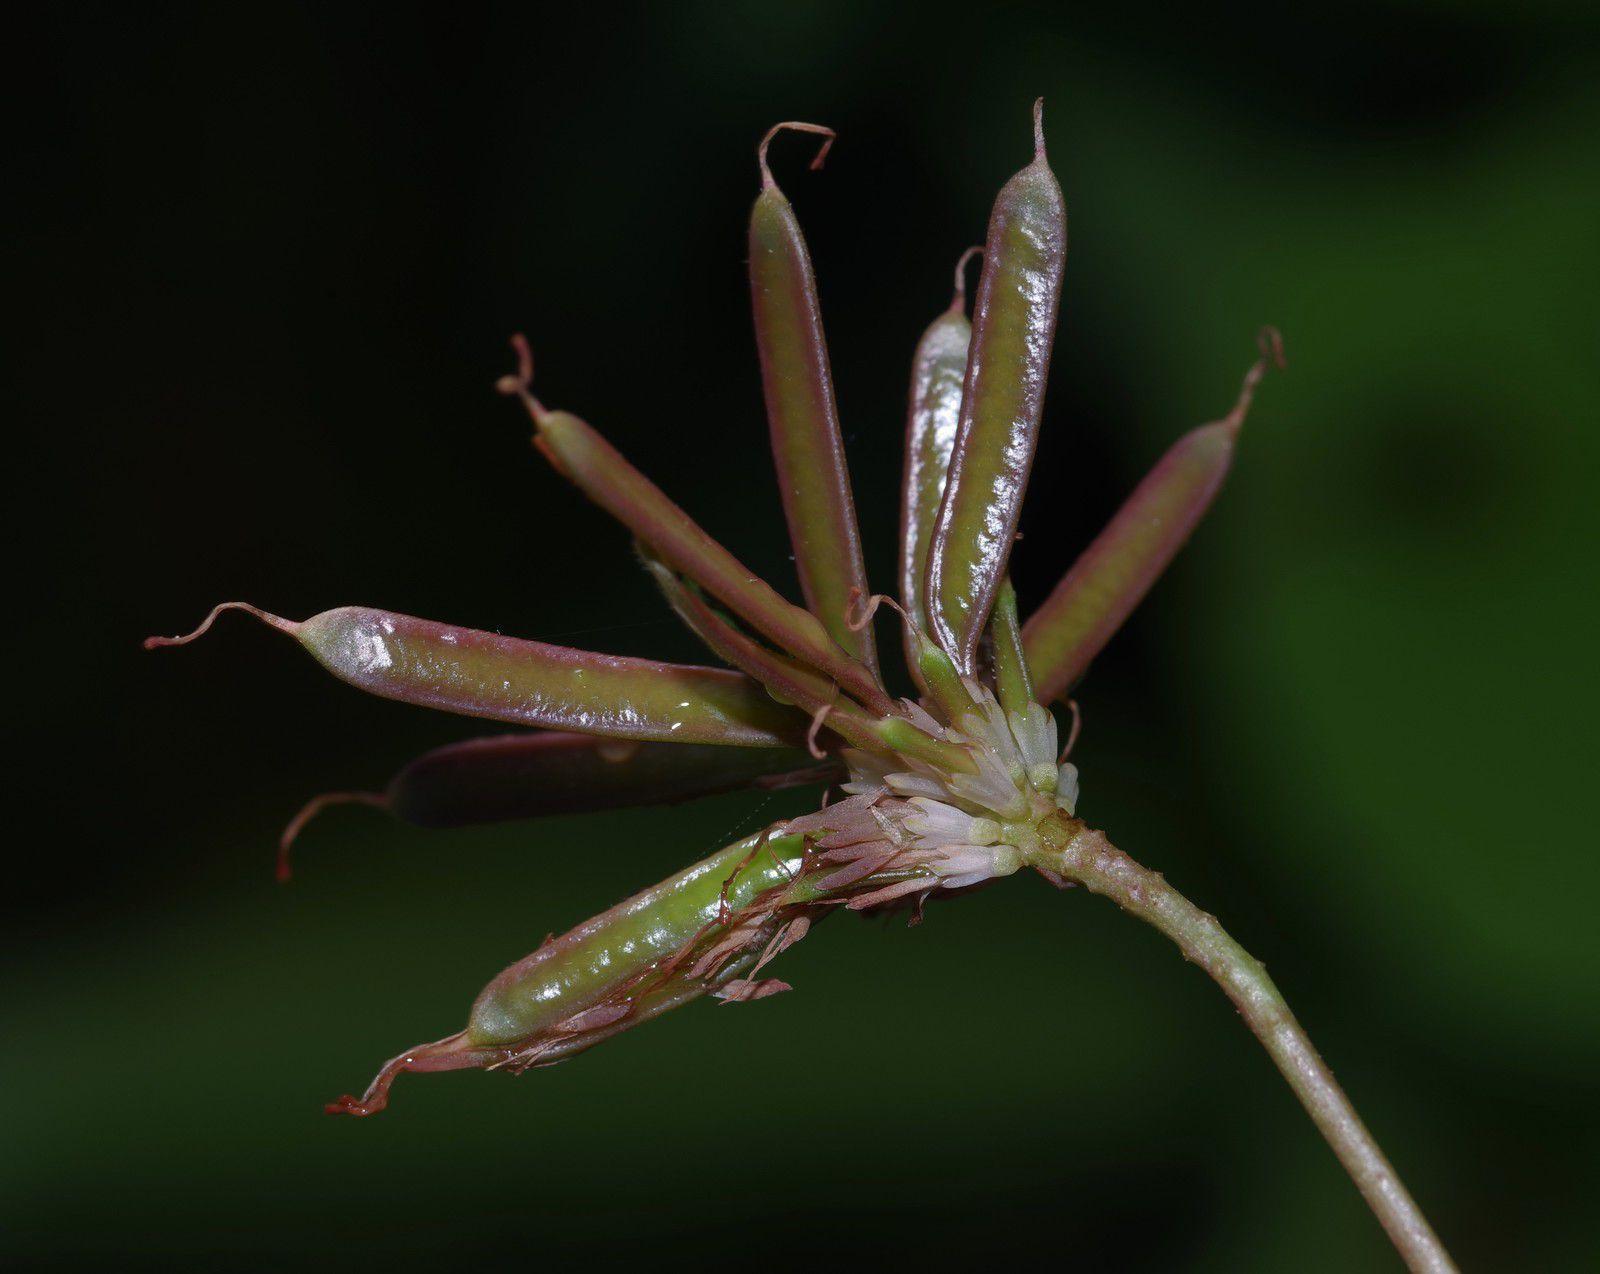 Neptunia plena